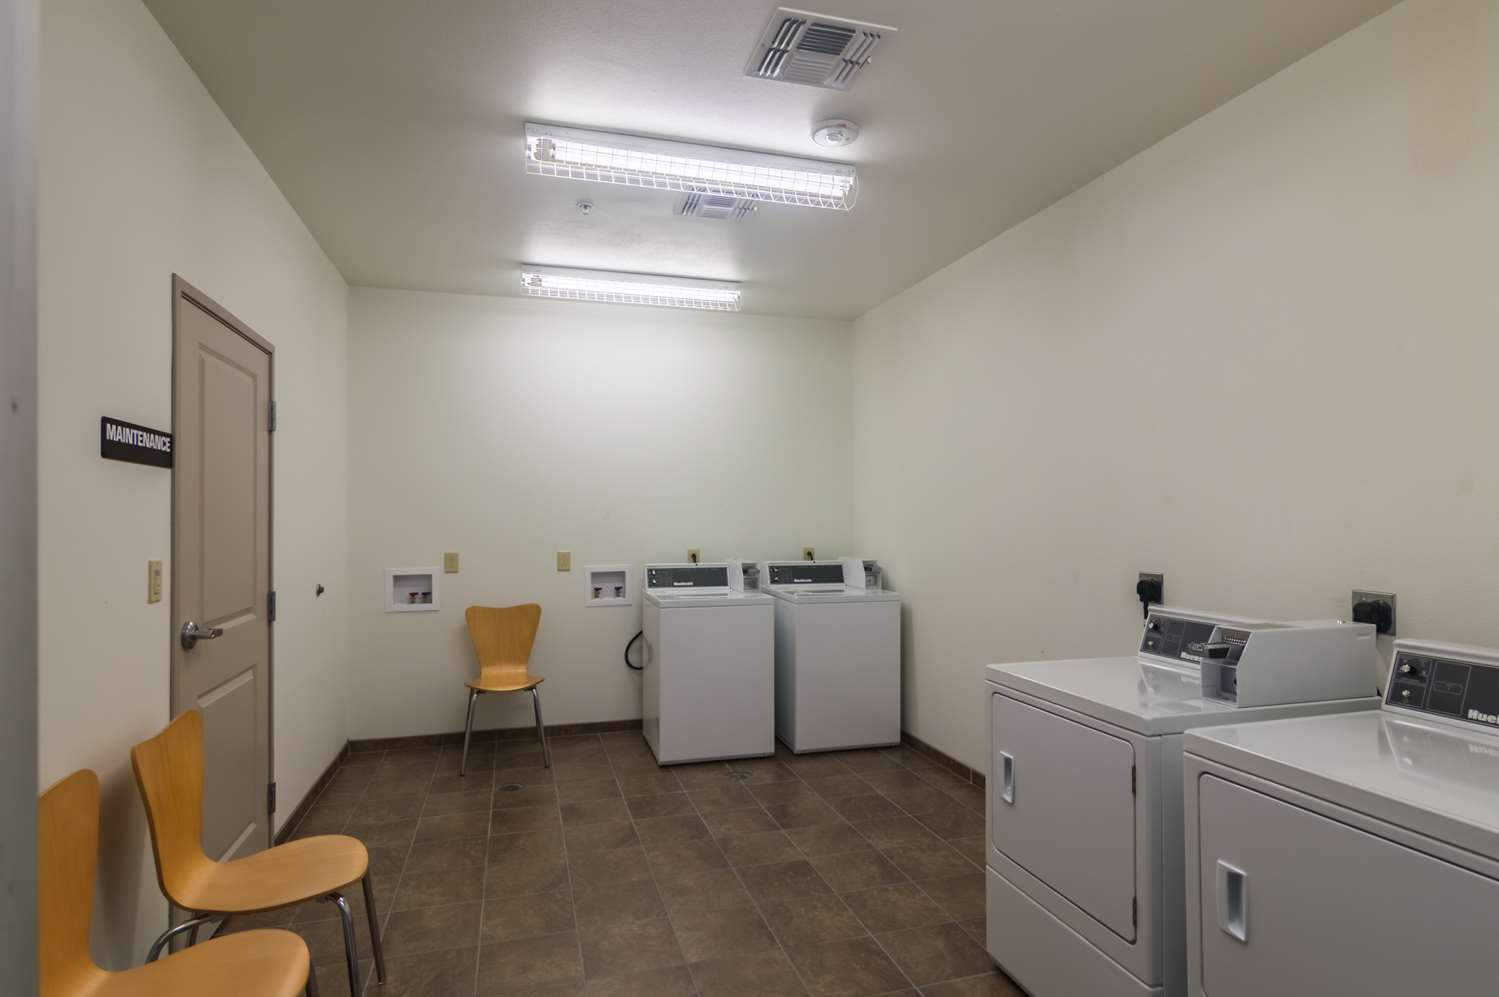 proam - Studio 6 Extended Stay Hotel Colorado City